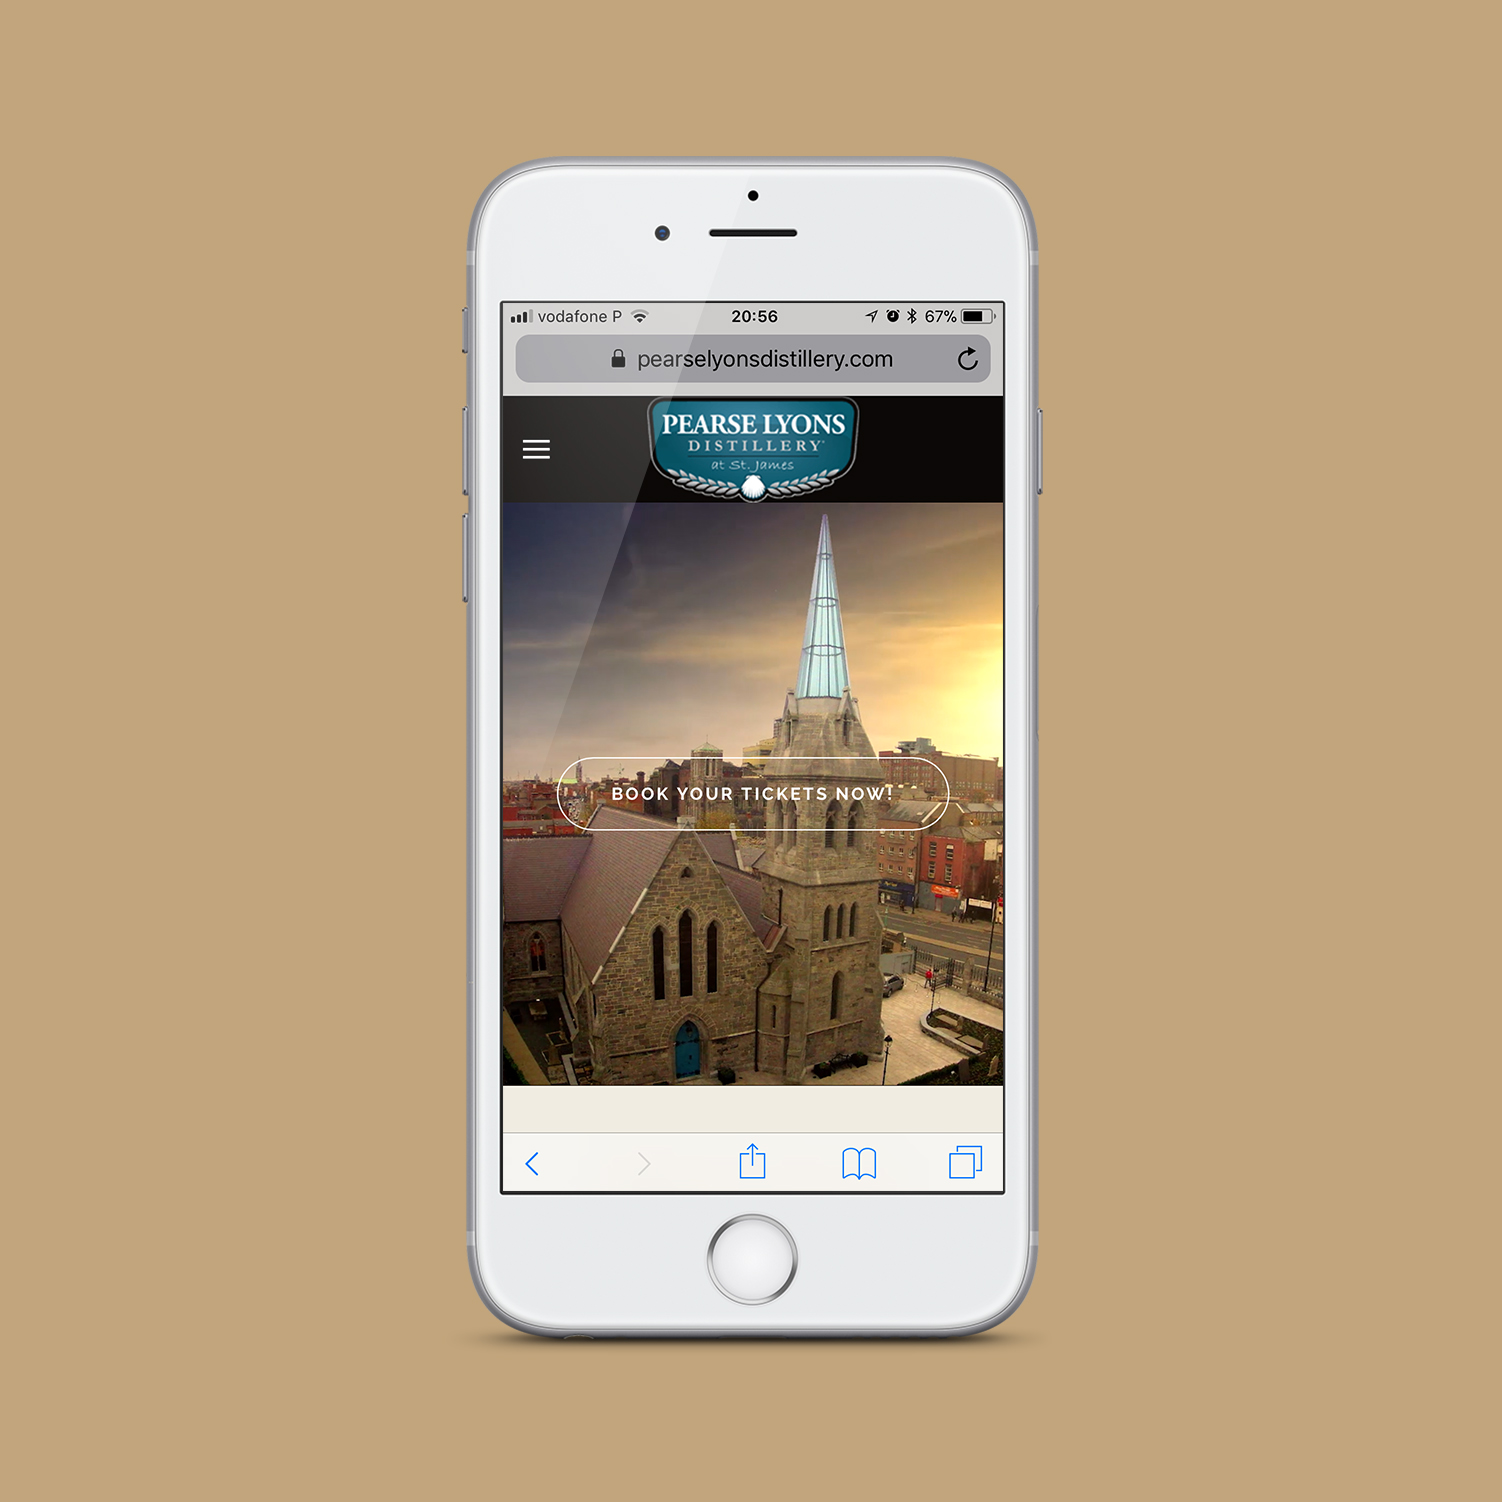 pld-site-iphone3.jpg